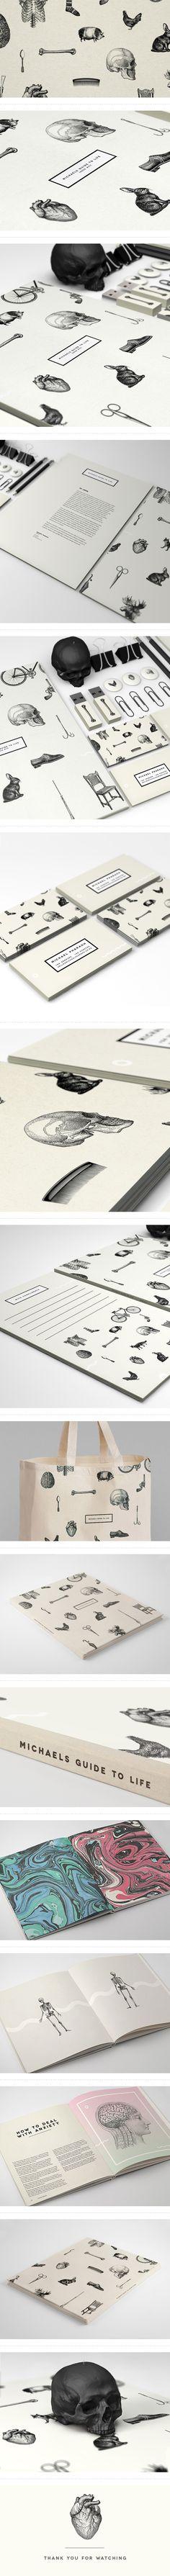 Michael's Guide To Life | #stationary #corporate #design #corporatedesign #identity #branding #marketing < repinned by www.BlickeDeeler.de | Take a look at www.LogoGestaltung-Hamburg.de